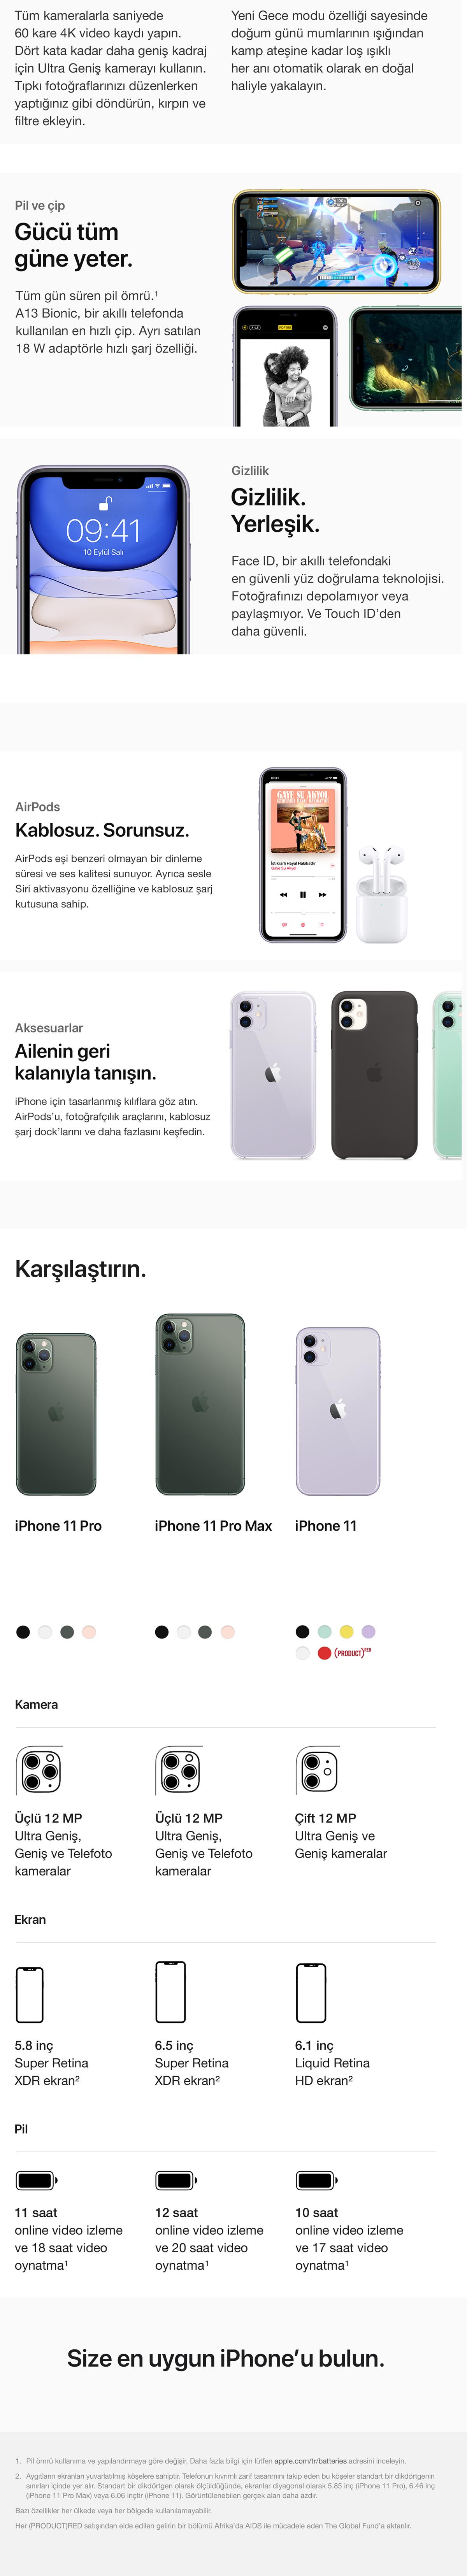 iphone-11-b.jpg